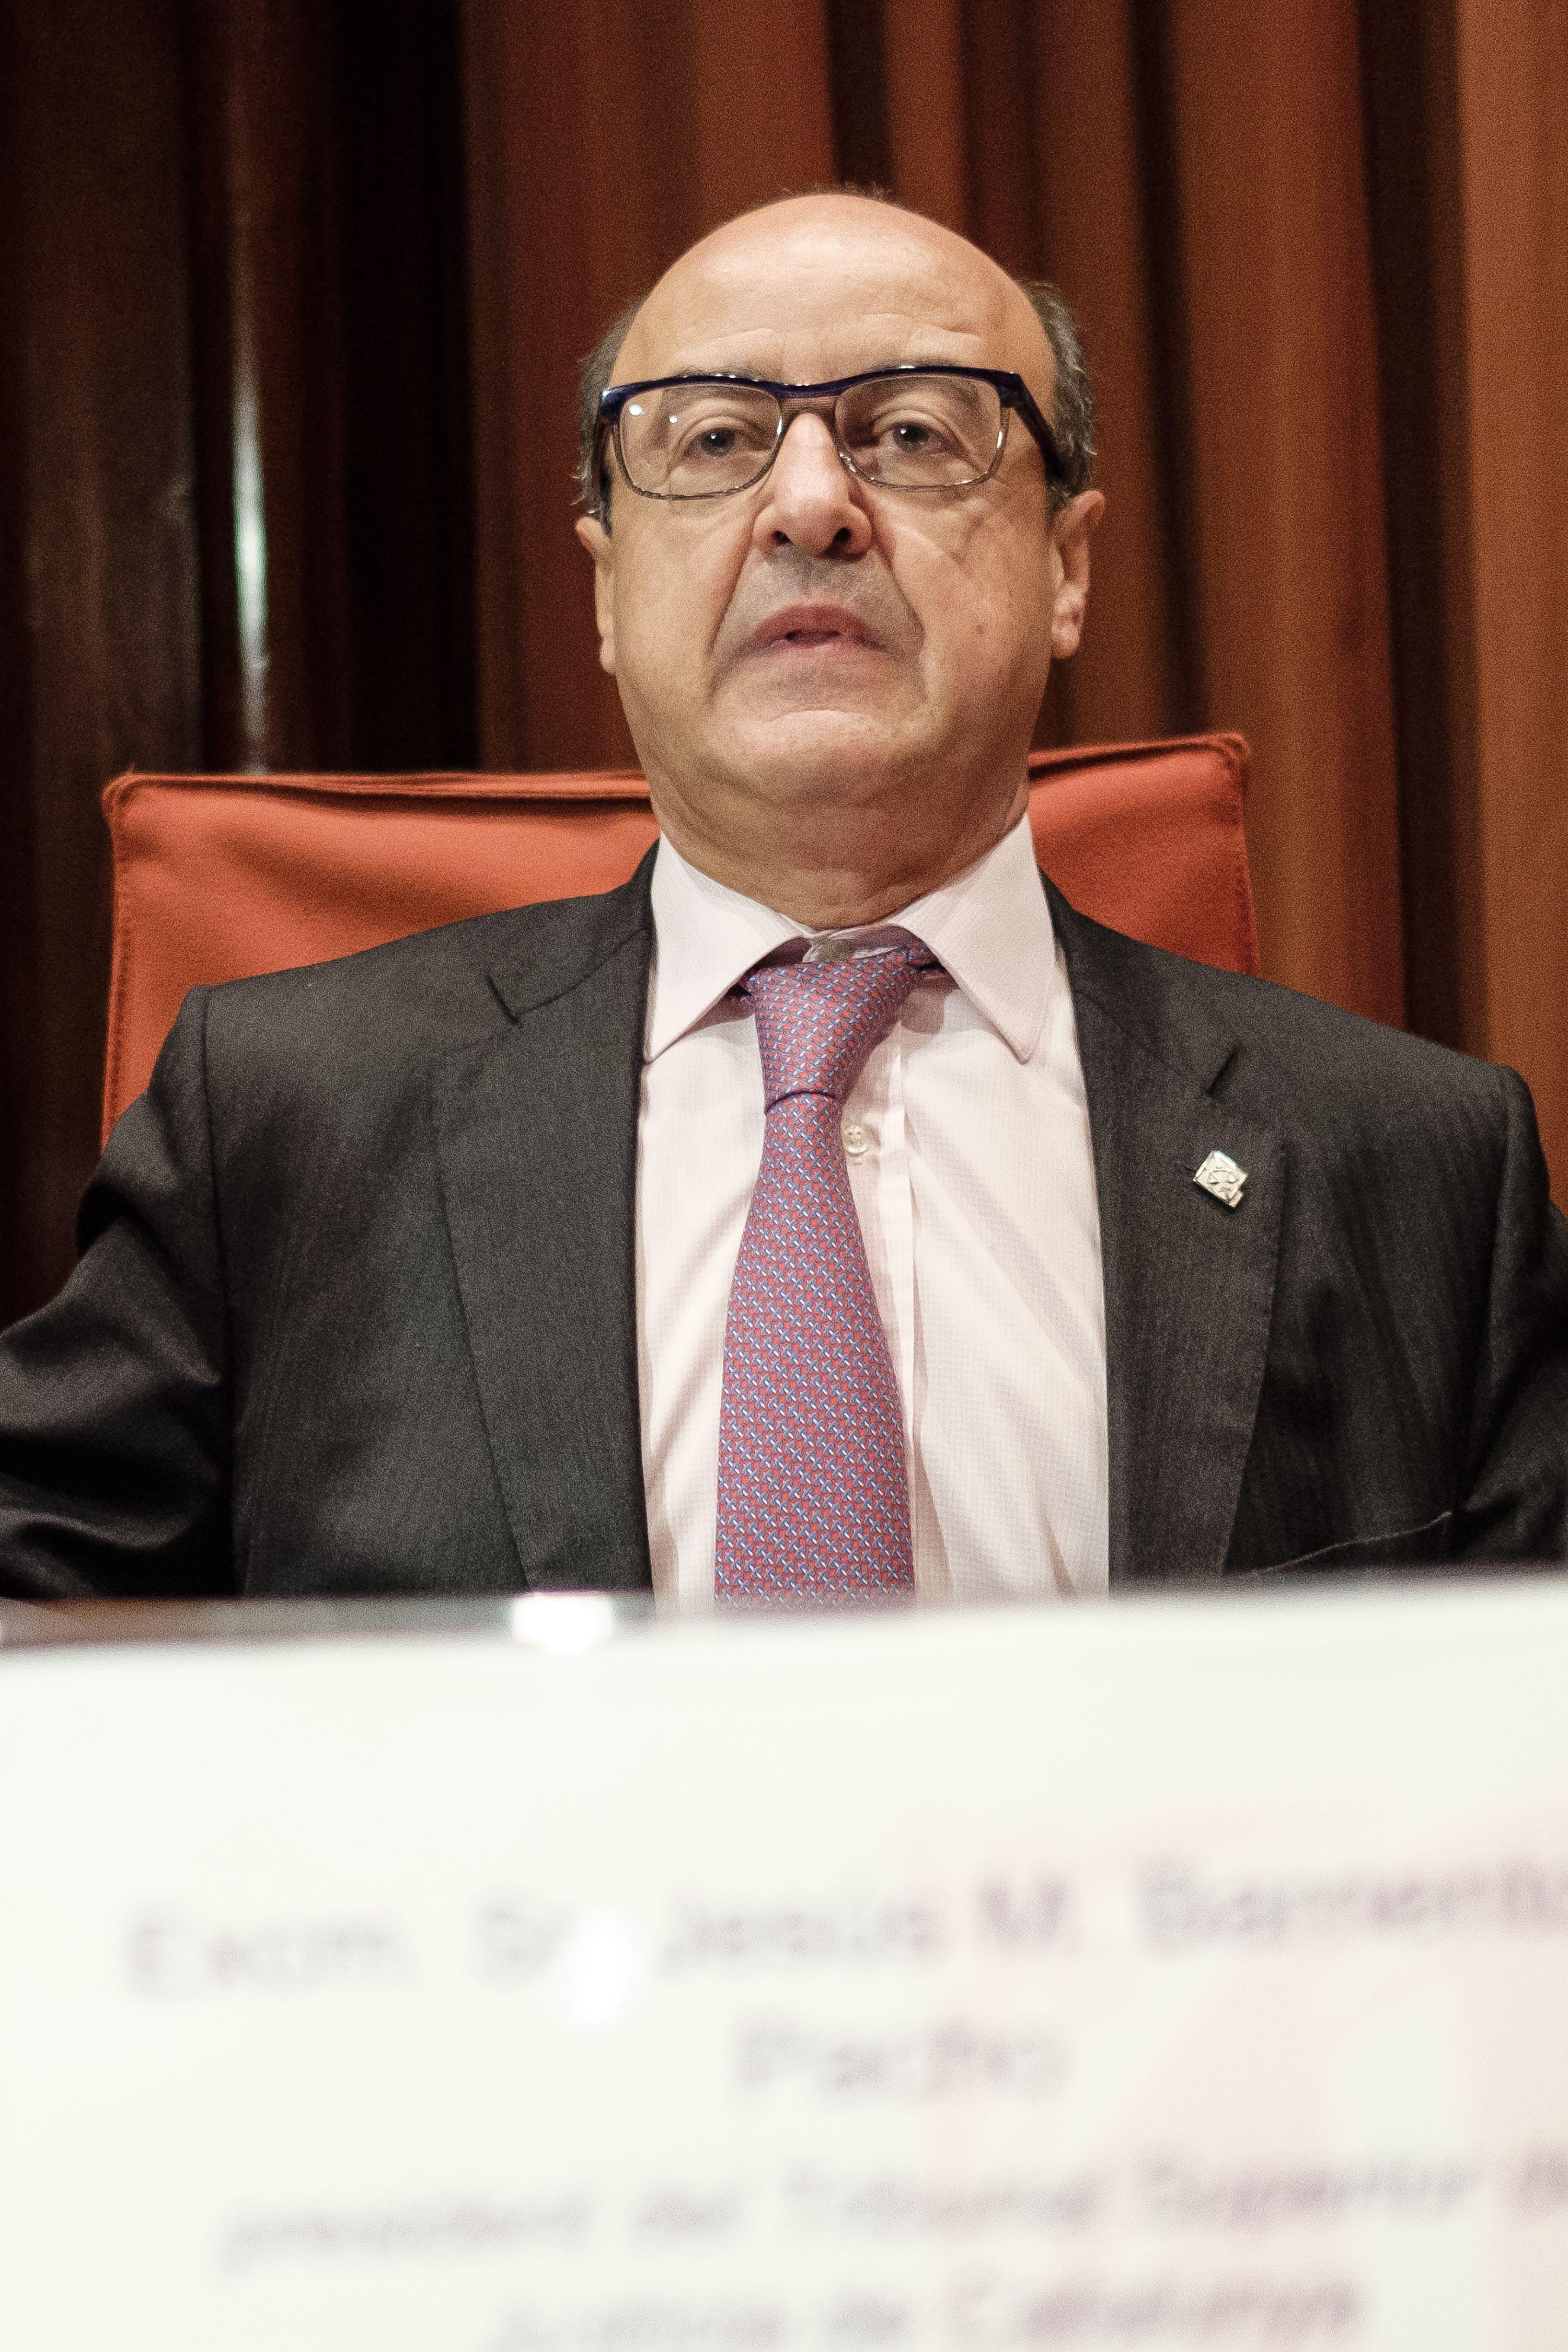 Jesus Maria Barrientos TSCJ - Sergi Alcazar